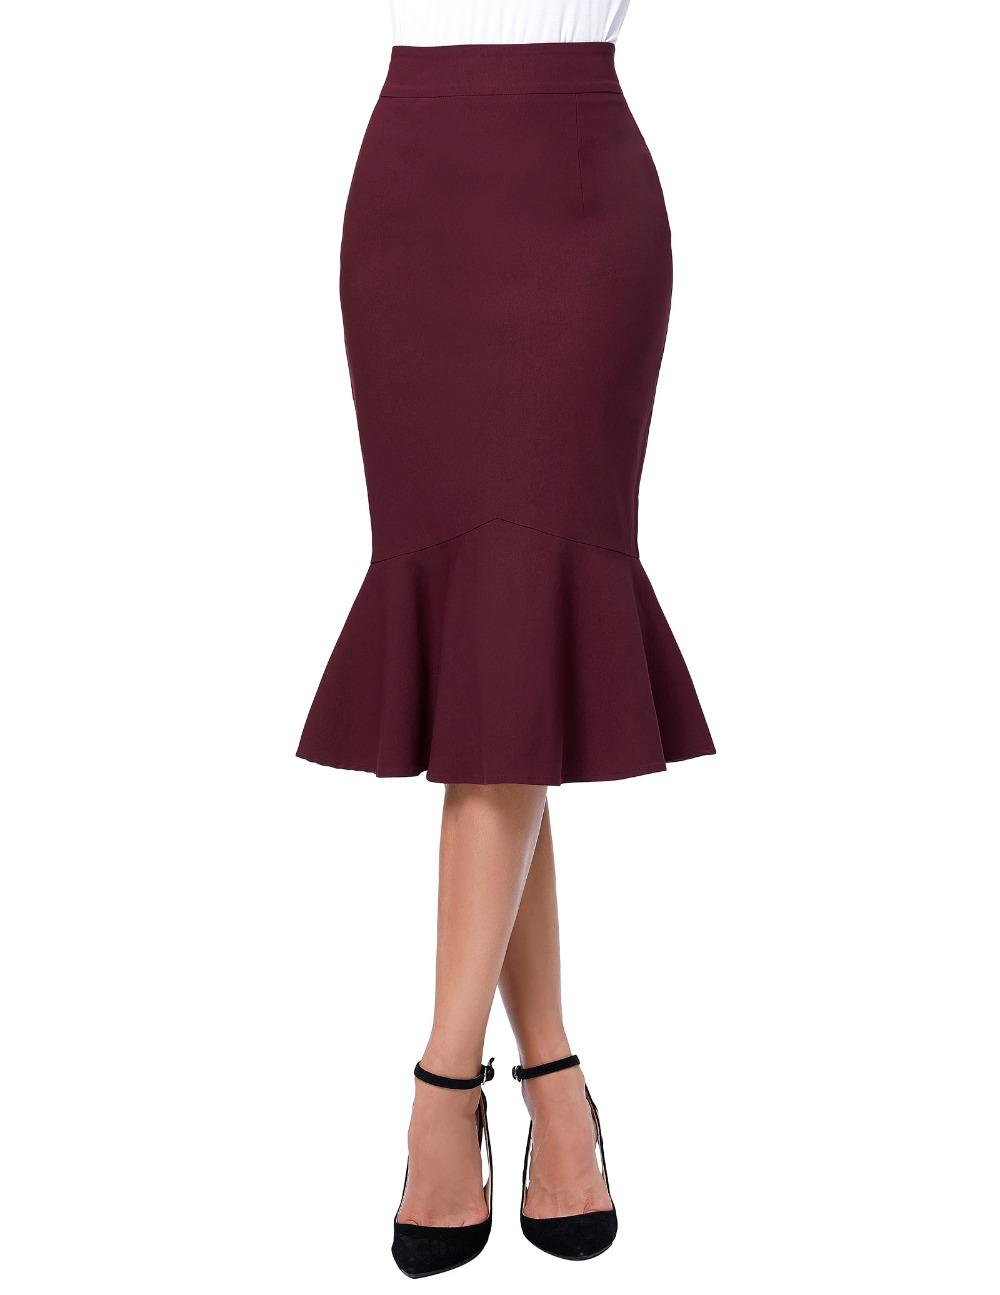 17 Skirts Faldas Women's Fashion OL Casual Mermaid Dark Wine Black Pencil Skirt Jupe Longue High Waist Sexy Long Skirt 1